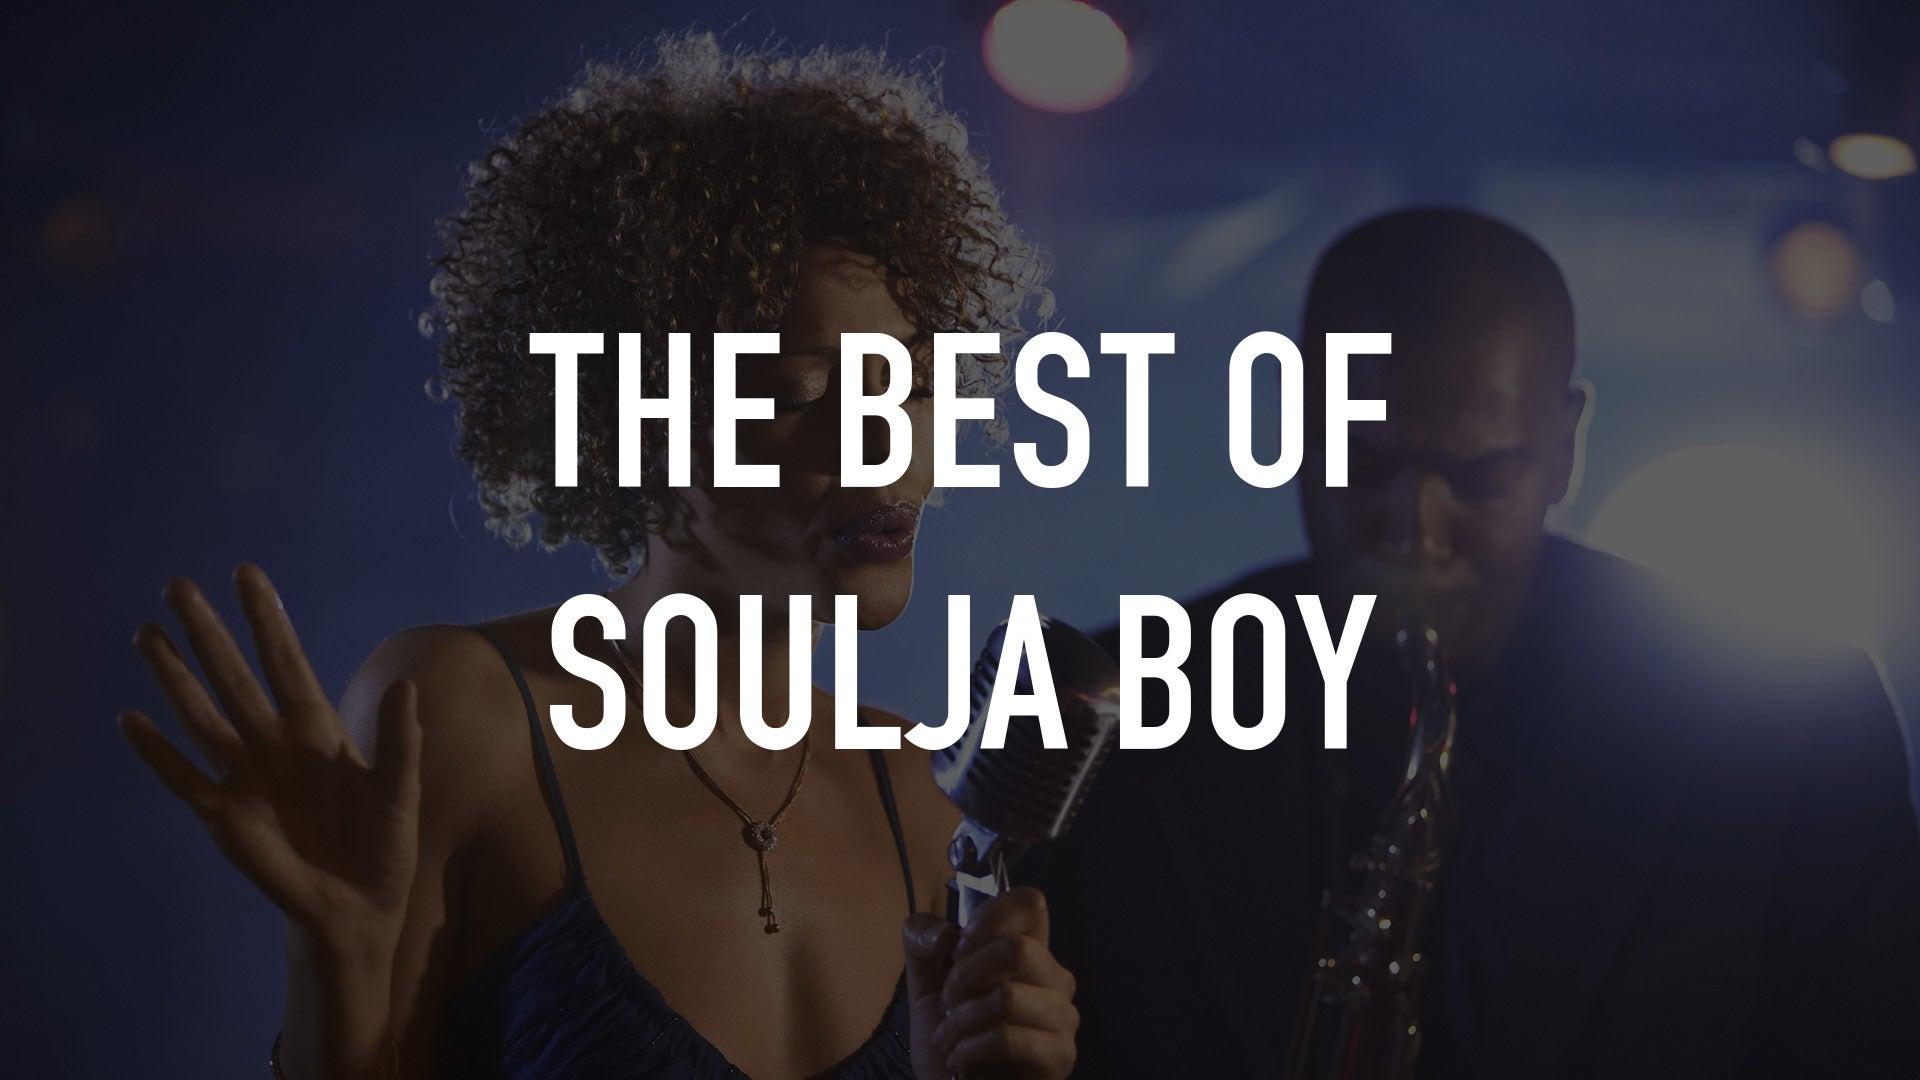 The Best of Soulja Boy